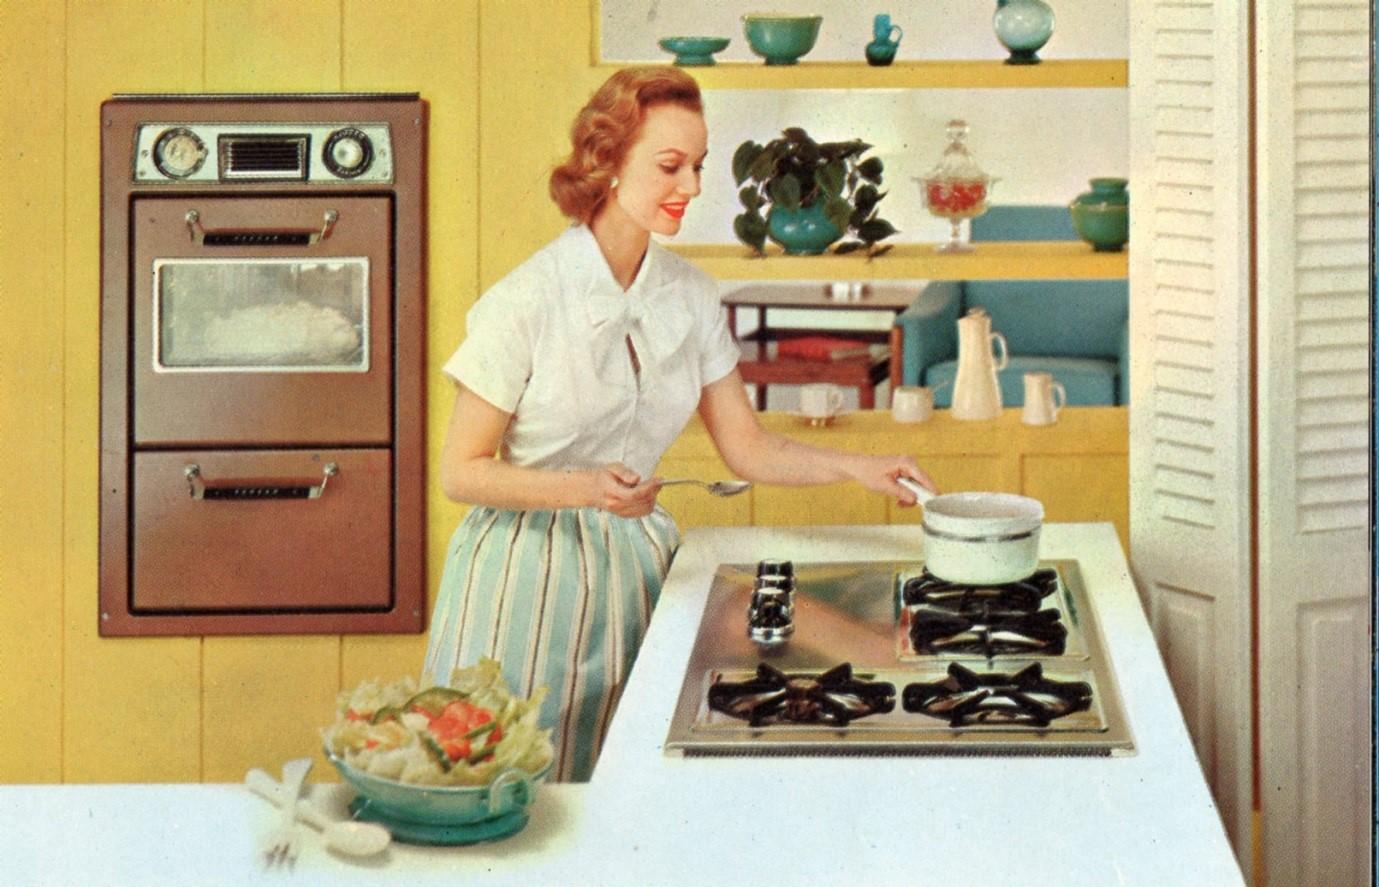 Recipe for a kitchen splash back